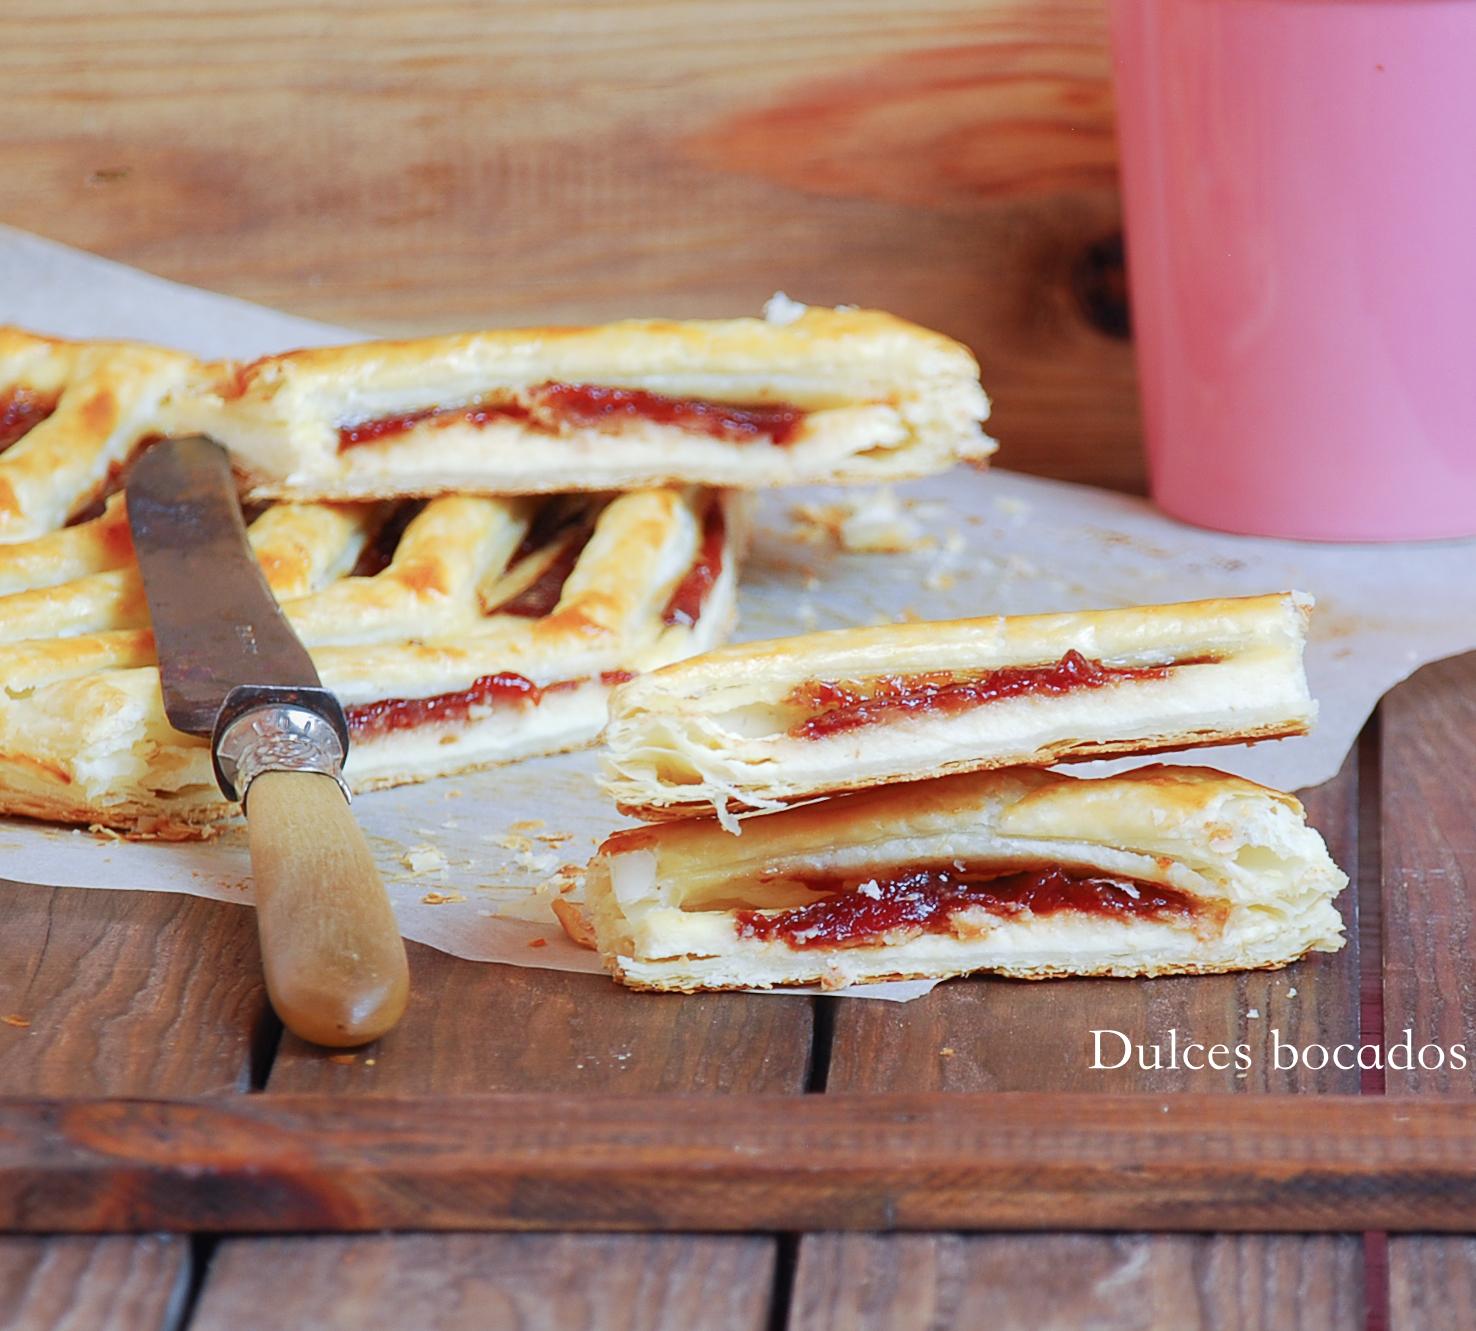 Guava And Cream Cheese Pastry Recipes — Dishmaps